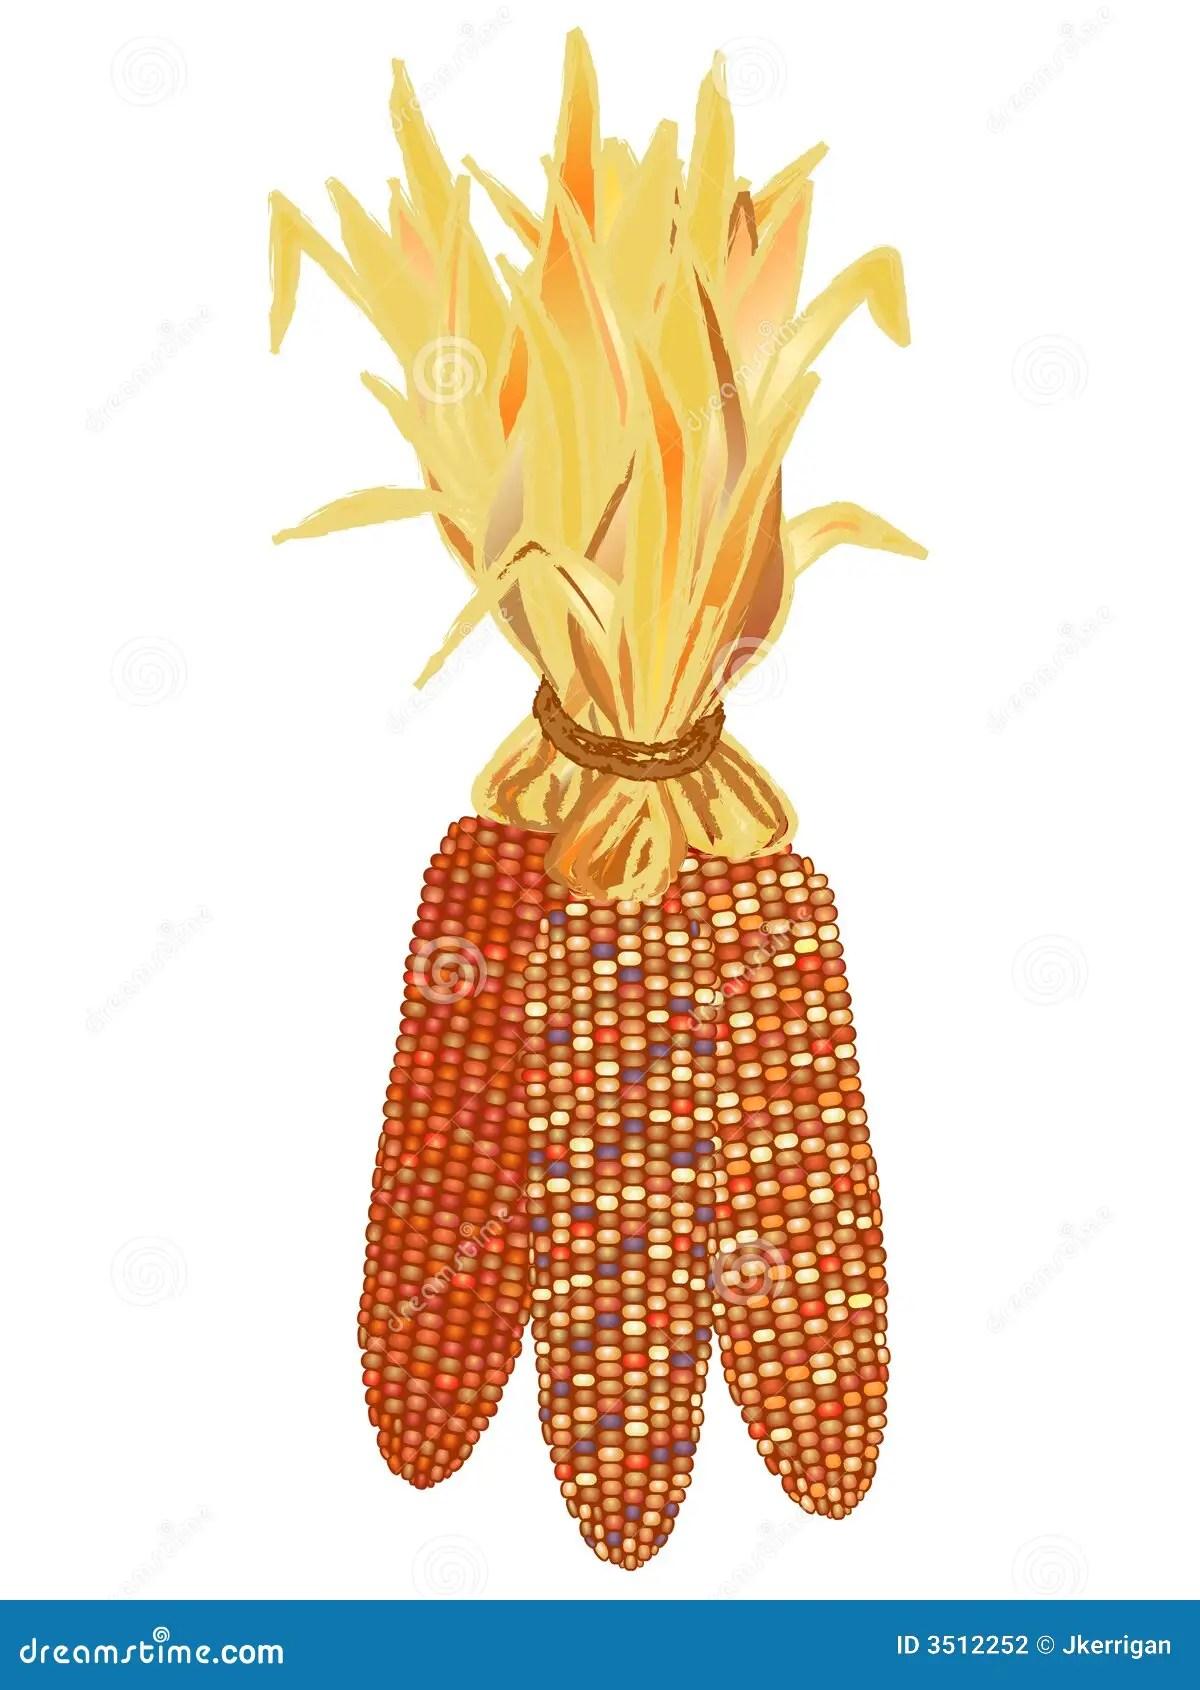 Indian Corn Stock Vector Image Of Design Shape Blue